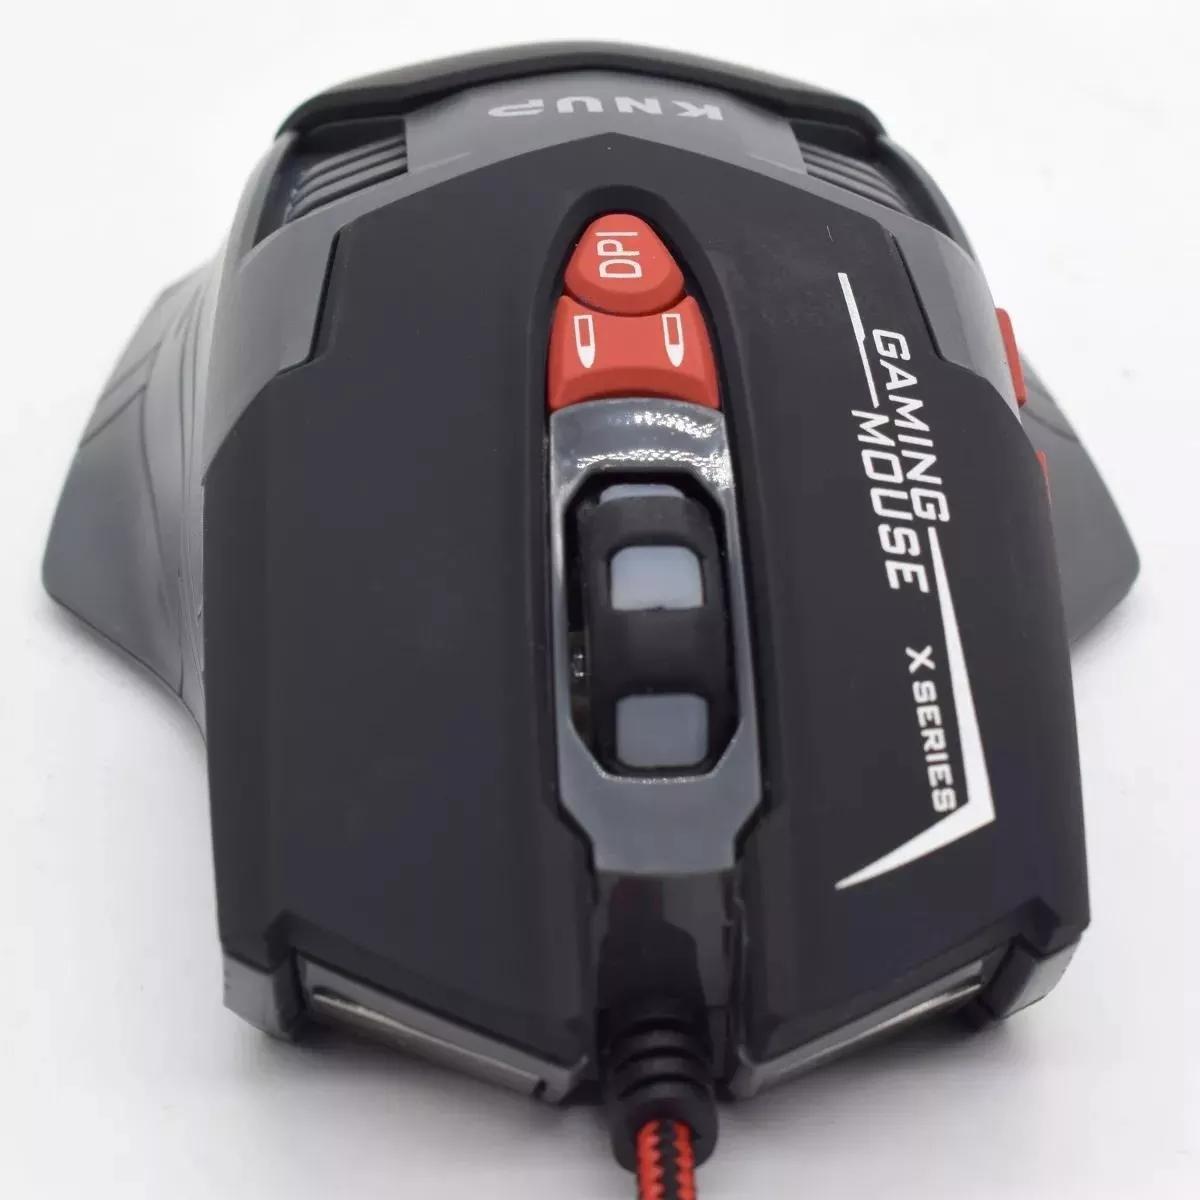 Mouse Gamer Croma Macro 7 Cores X1 Knup Pubg Csgo Lol T4